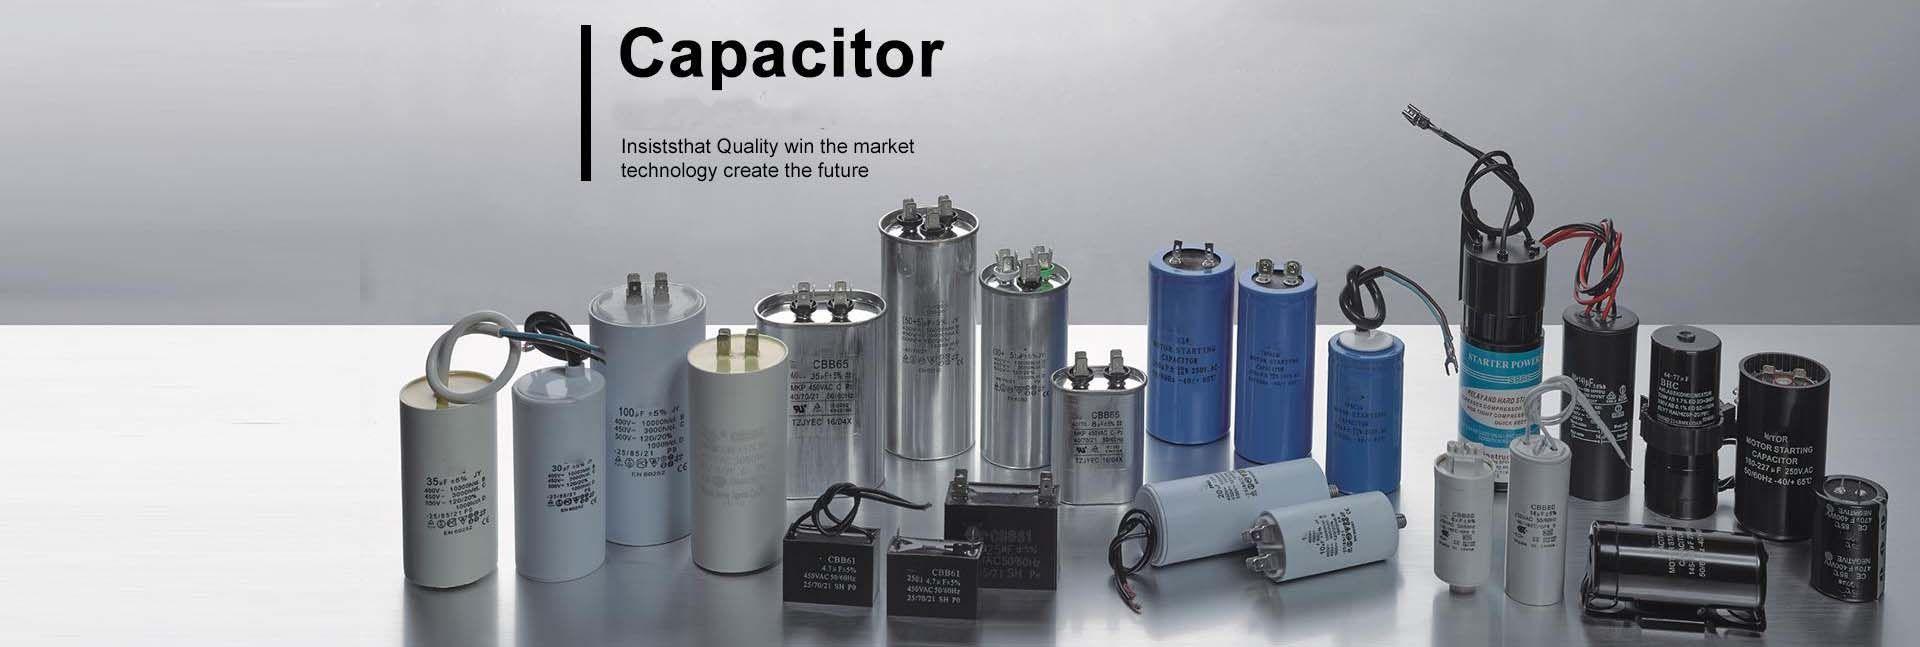 Huatao Capacitor Run Capacitor Fan Capacitor Start Capacitor Air Conditioner Capacitor Capacitor Enterprise Development Marketing Technology